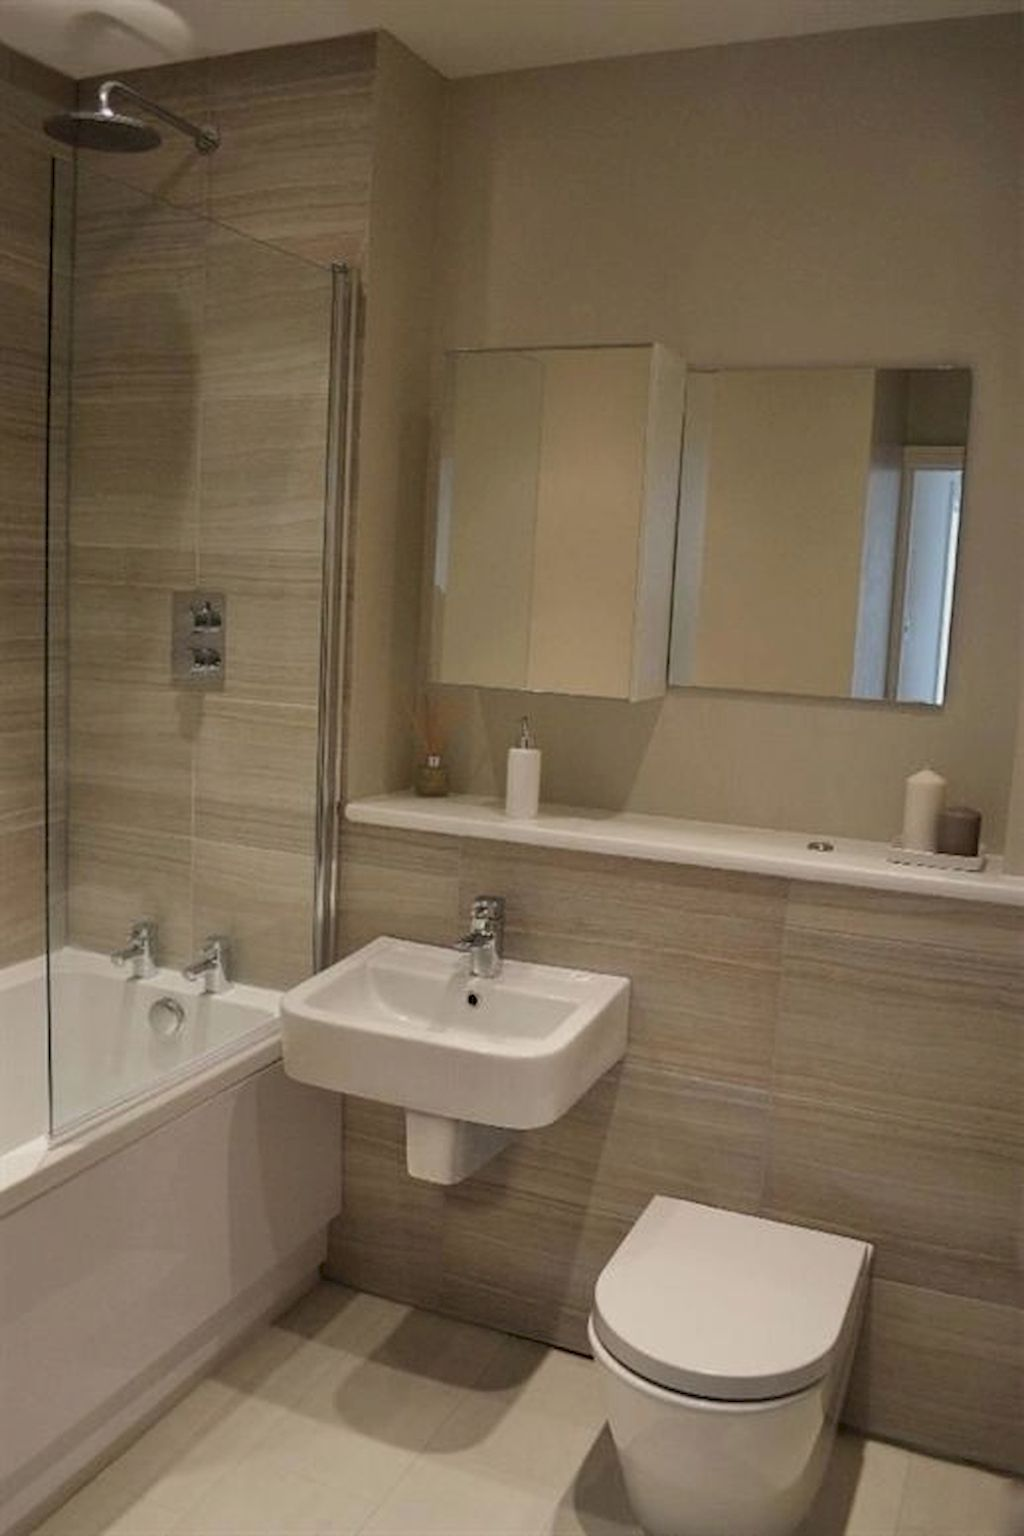 Enhancing The Feeling Of Space In Small Bathrooms Home To Z Beige Bathroom Simple Bathroom Simple Bathroom Designs